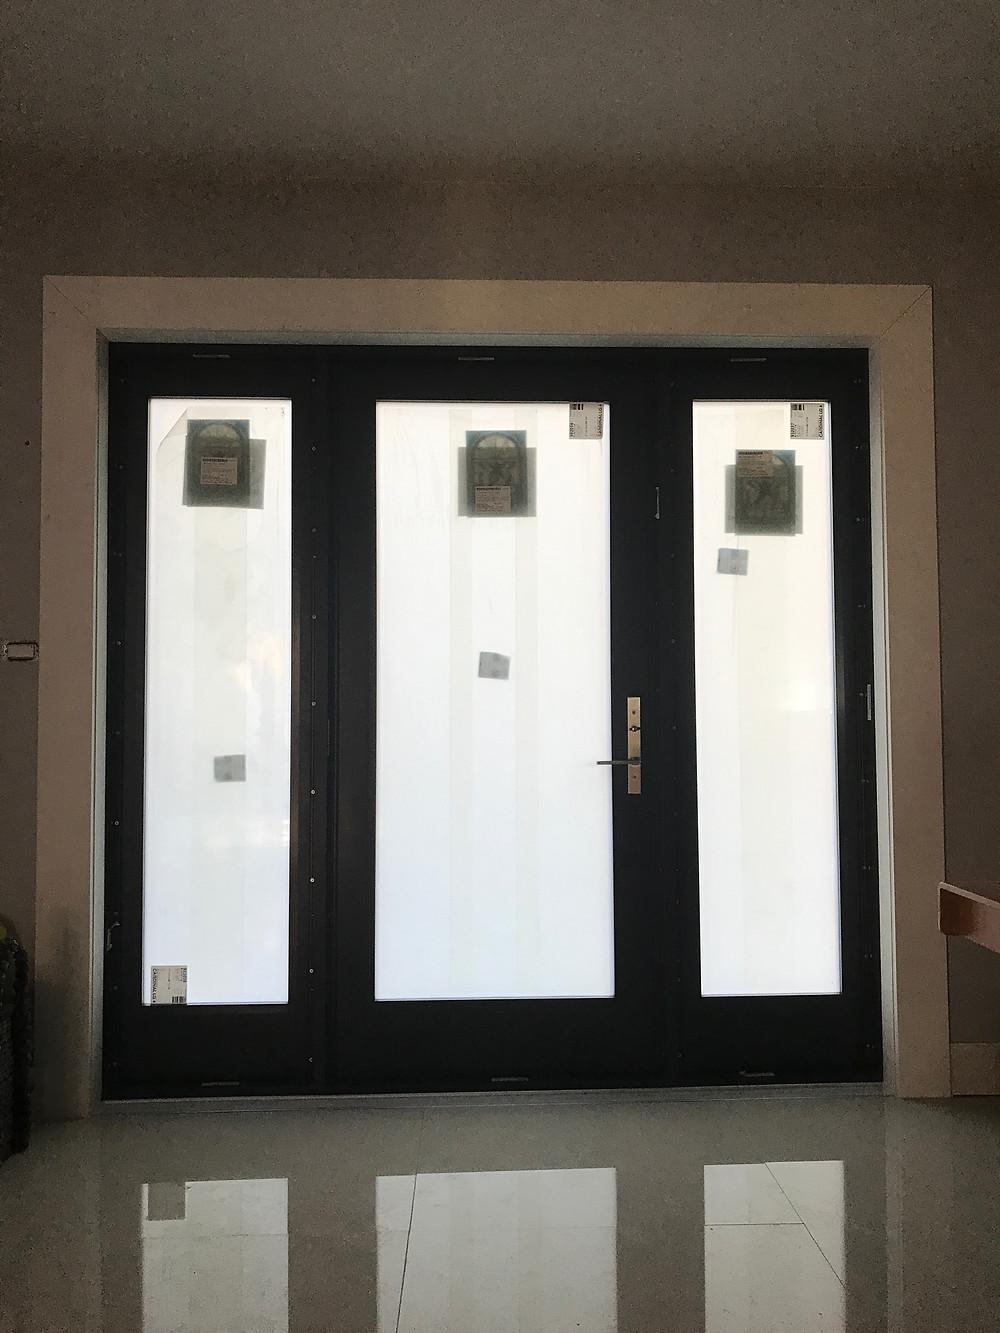 Impact window and doors.